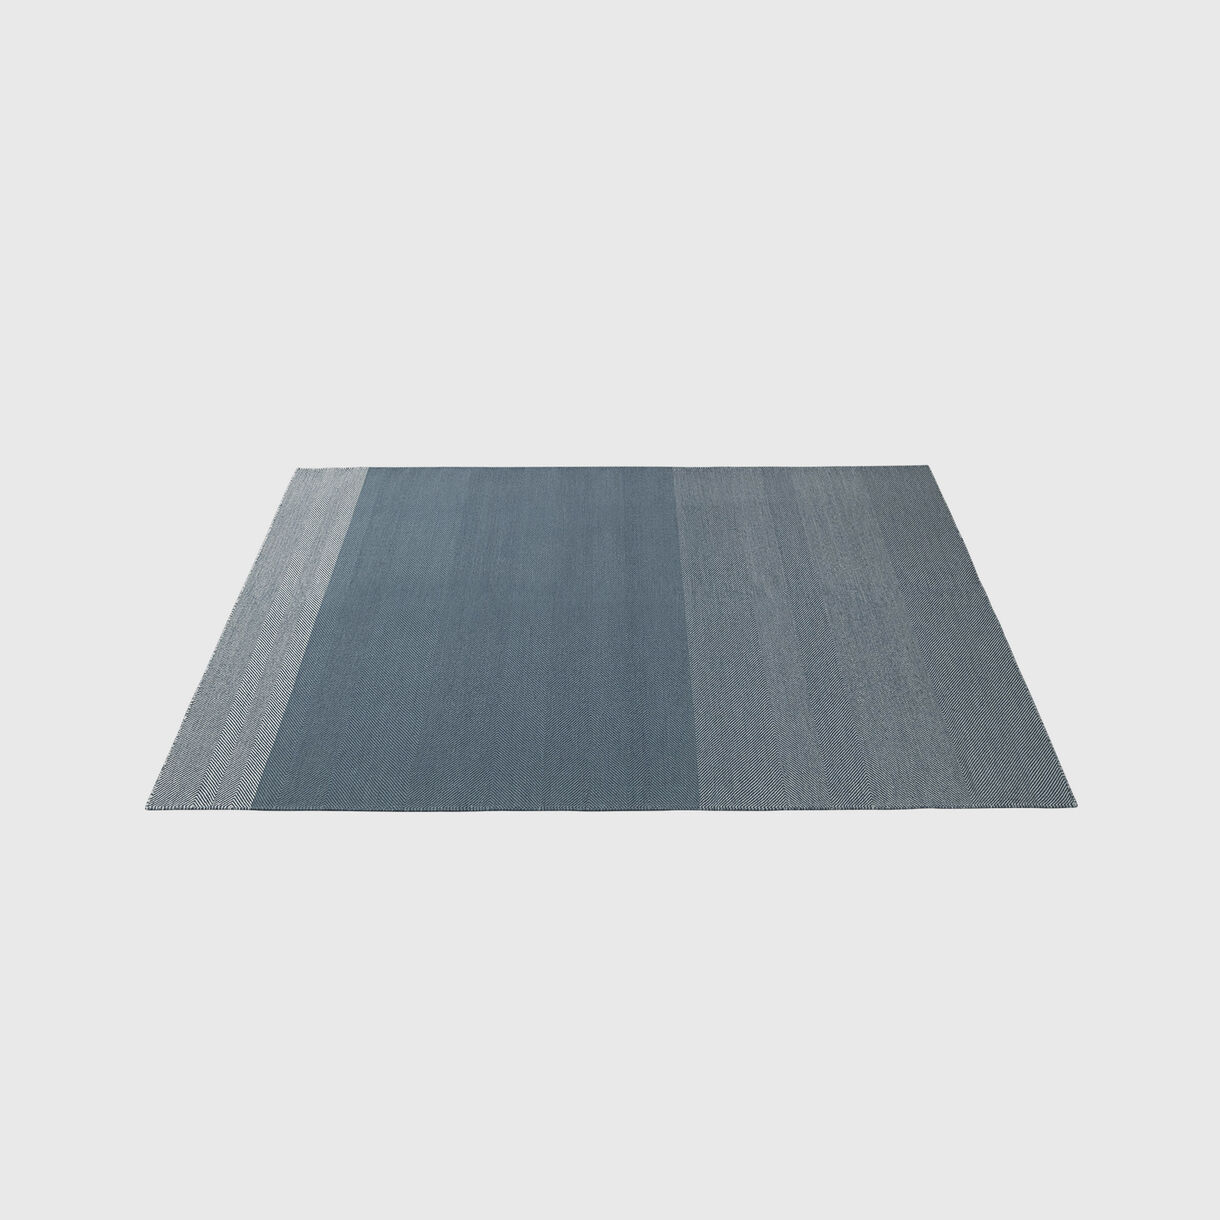 Varjo Rug 200x300cm, Blue